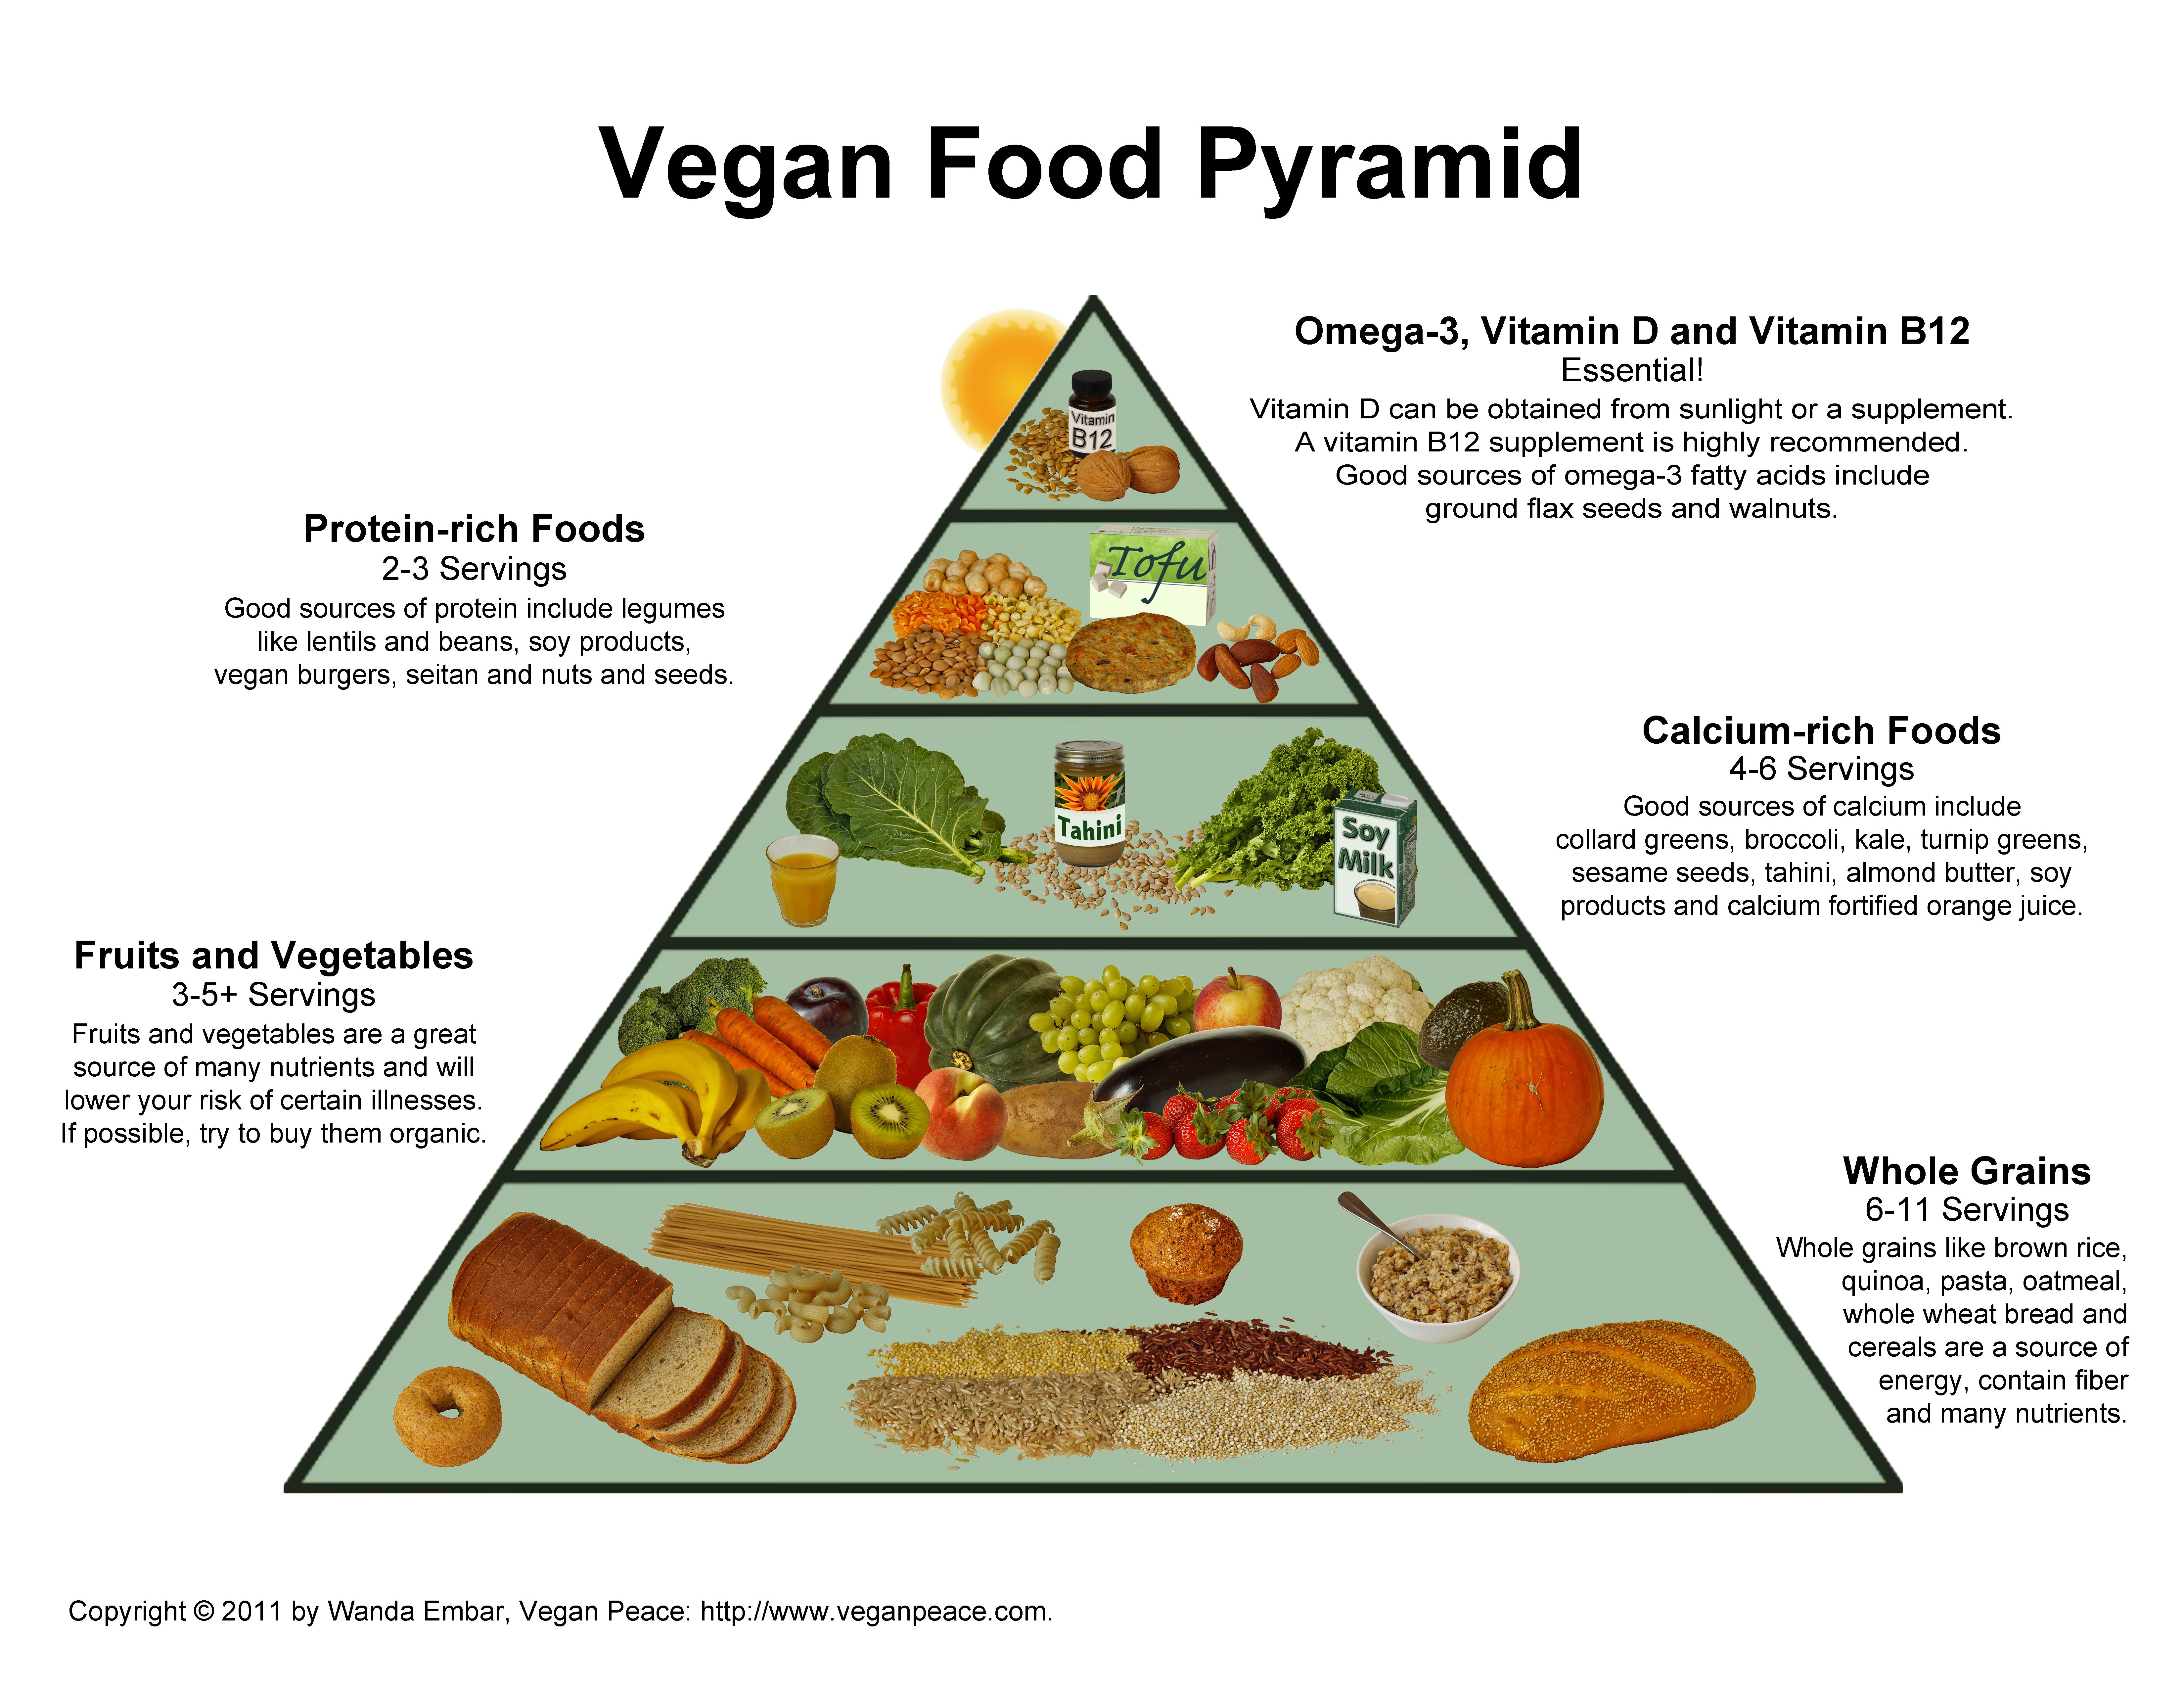 Veganfoodpyramid Png 6600 5100 Vegan Food Pyramid Food Pyramid Fruitarian Diet